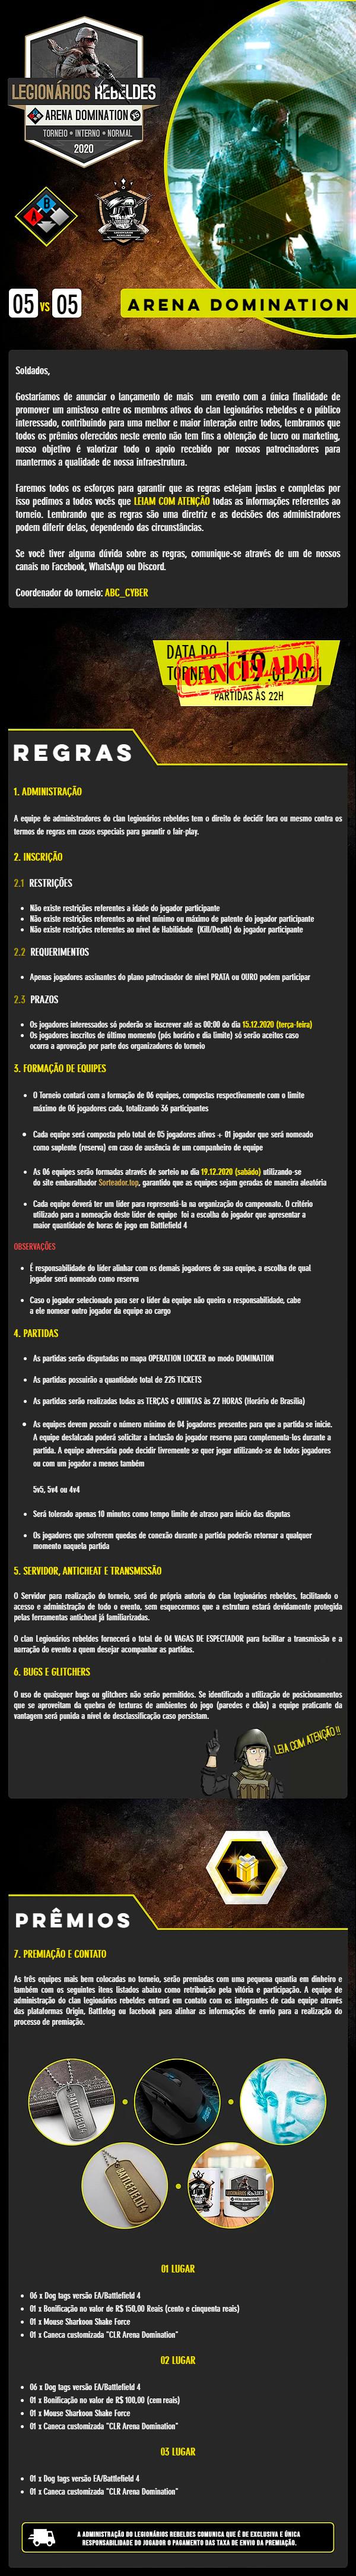 Background_Cancelado.jpg